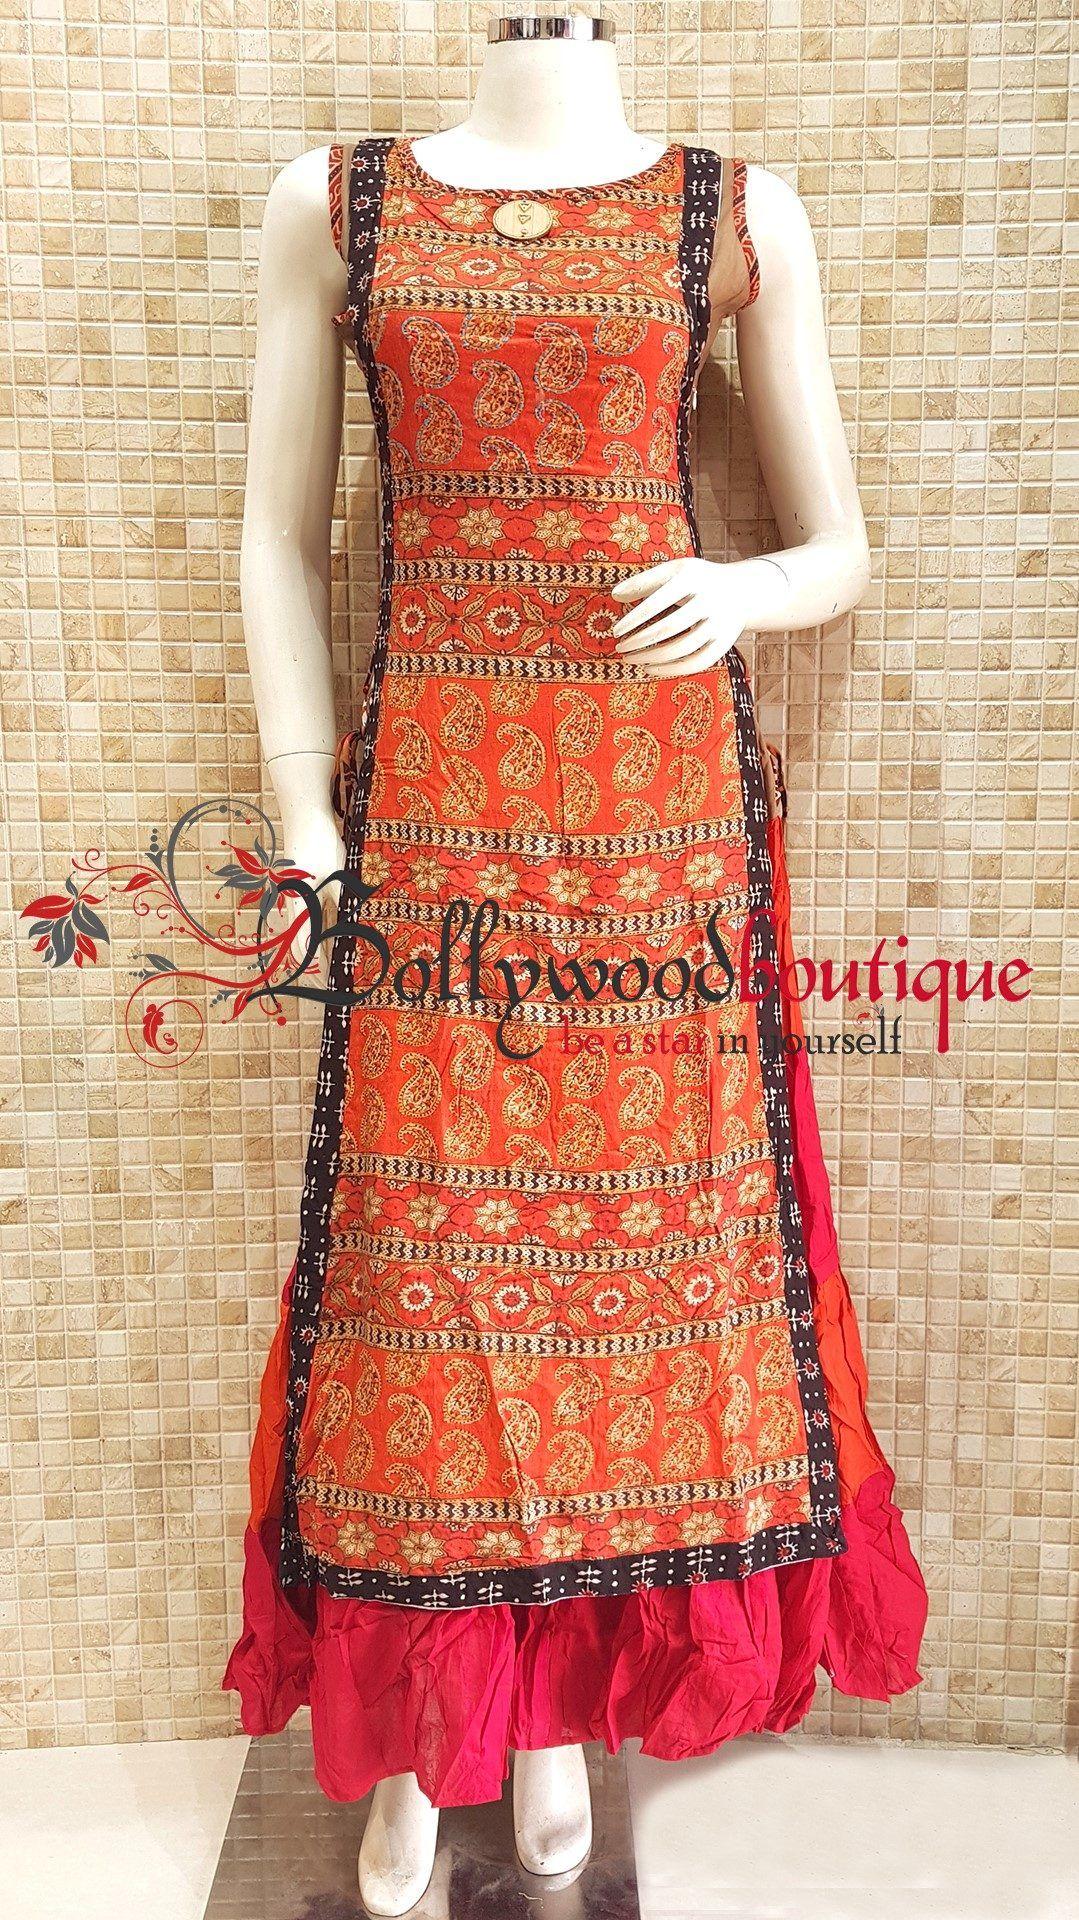 Ethnic dresses bollywood boutique ashok parekh pinterest